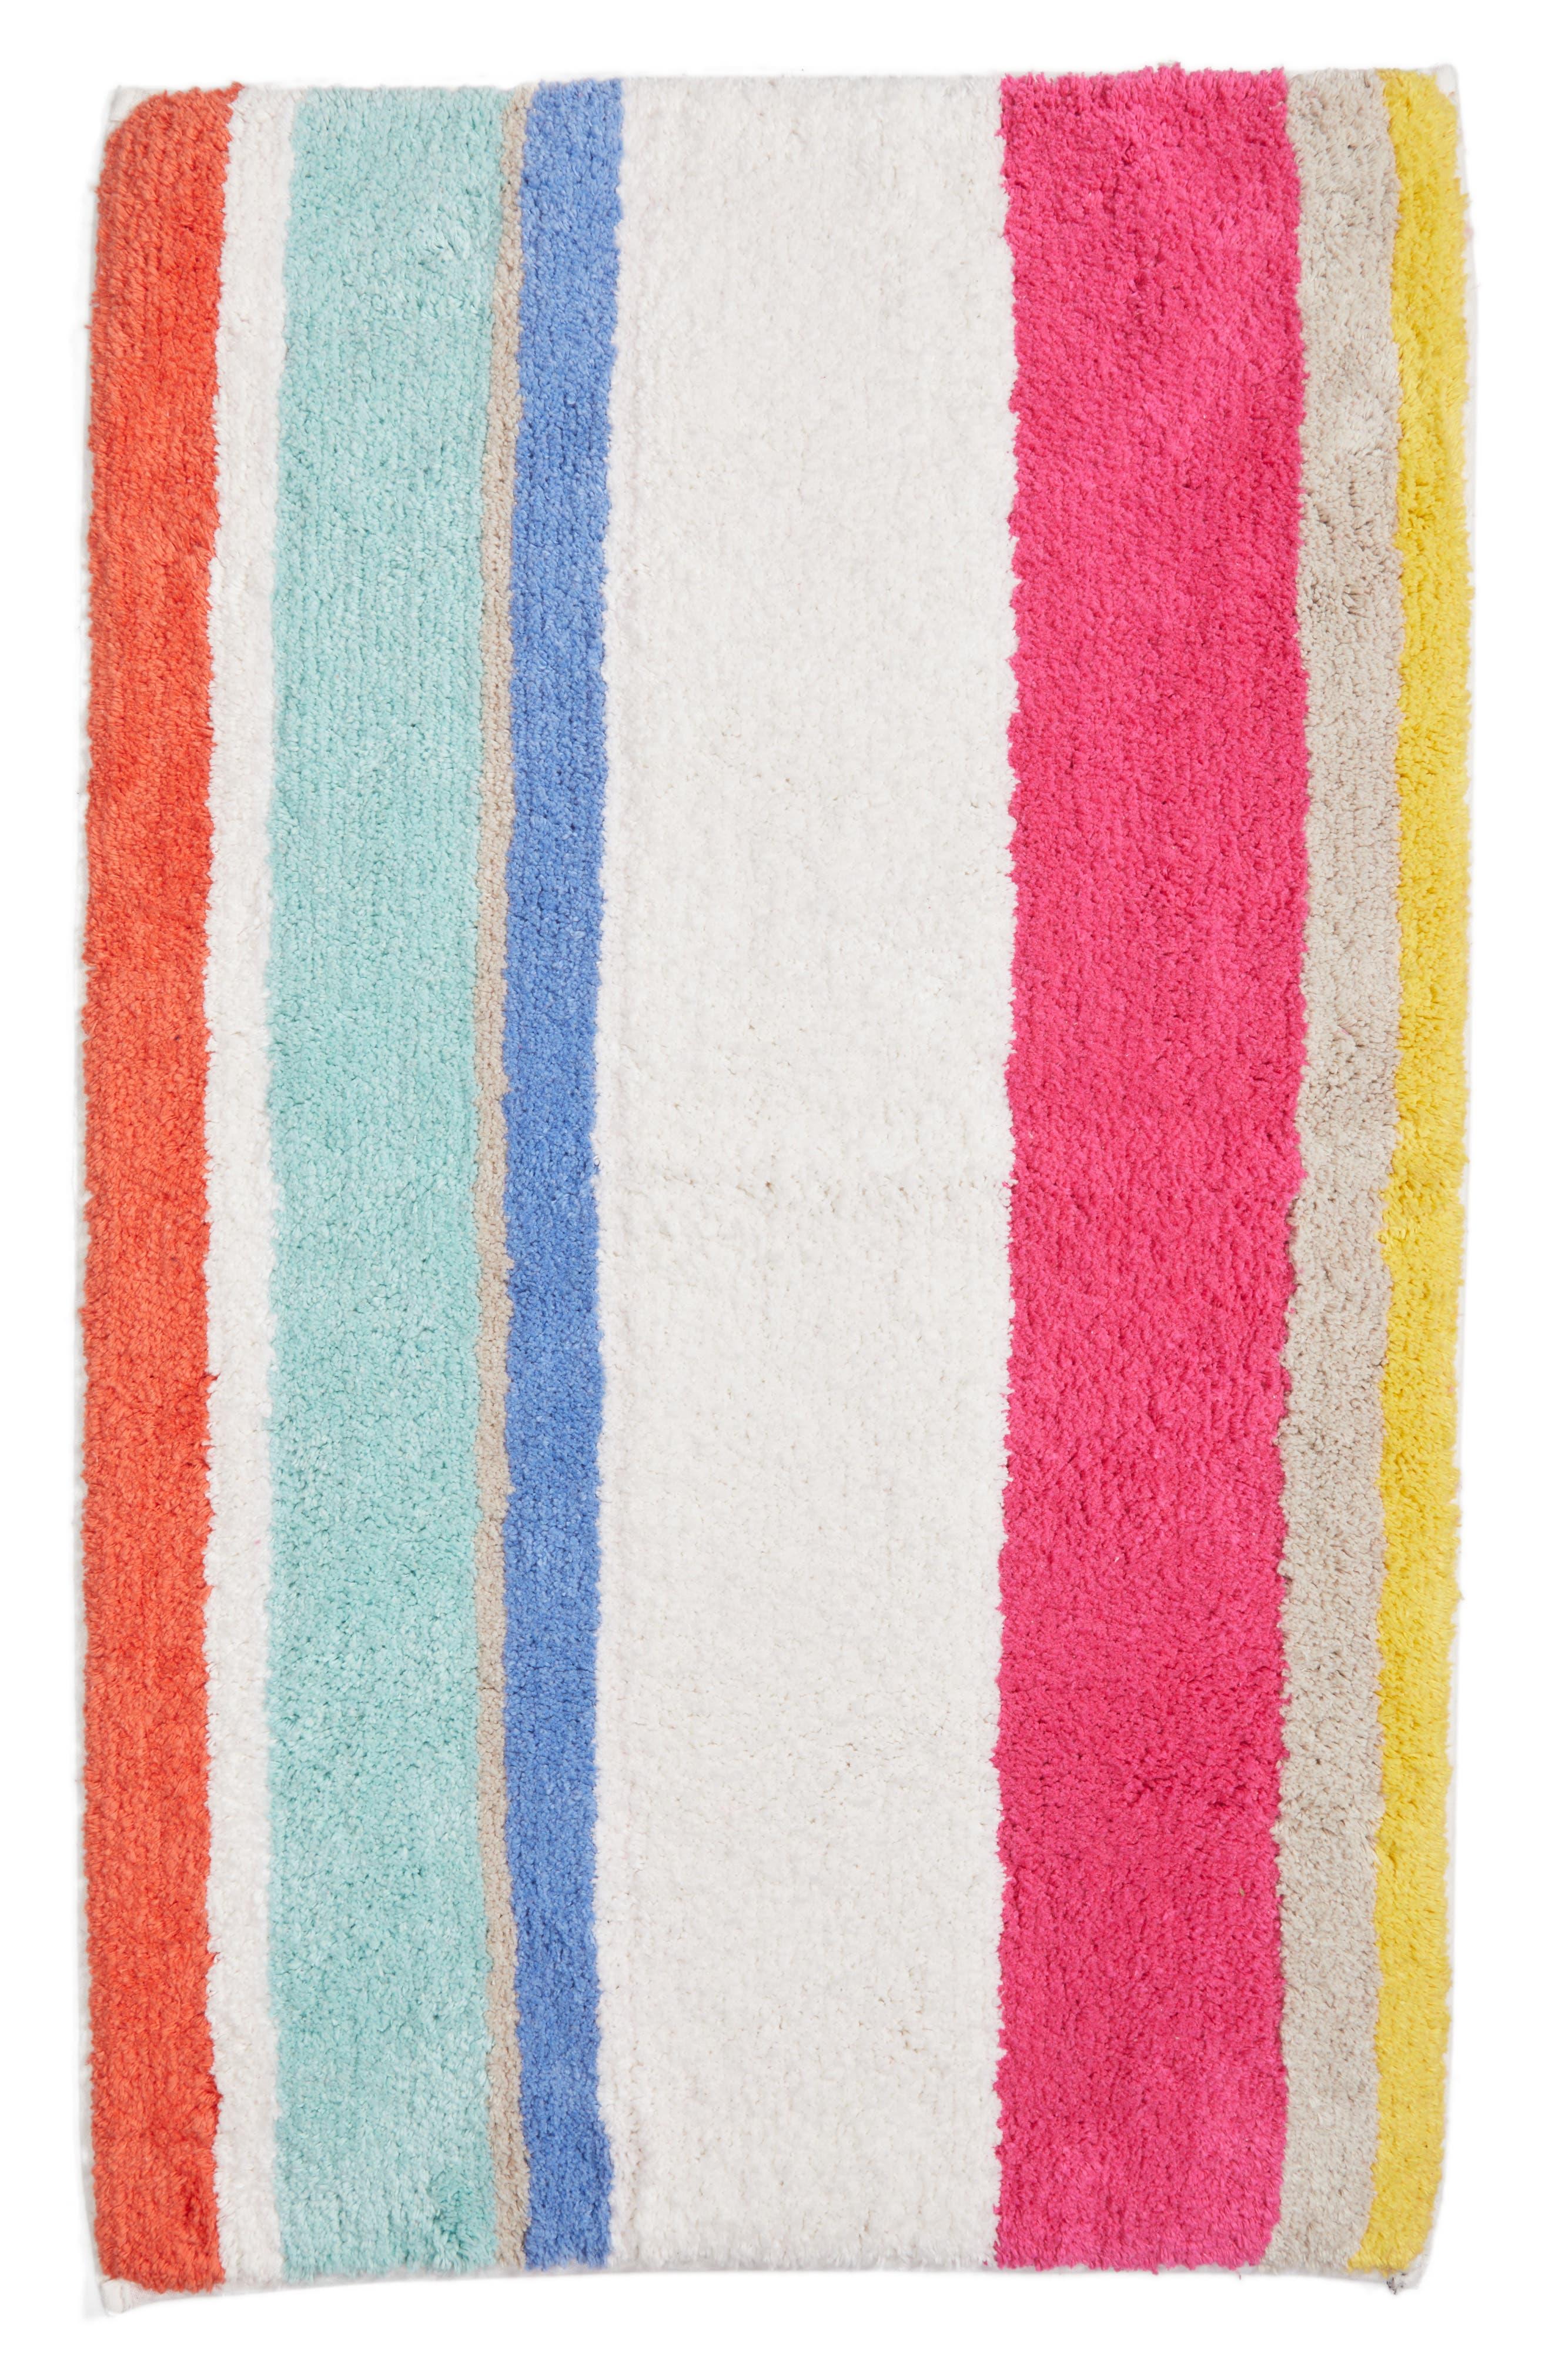 Alternate Image 1 Selected - kate spade new york paintball stripe bath rug